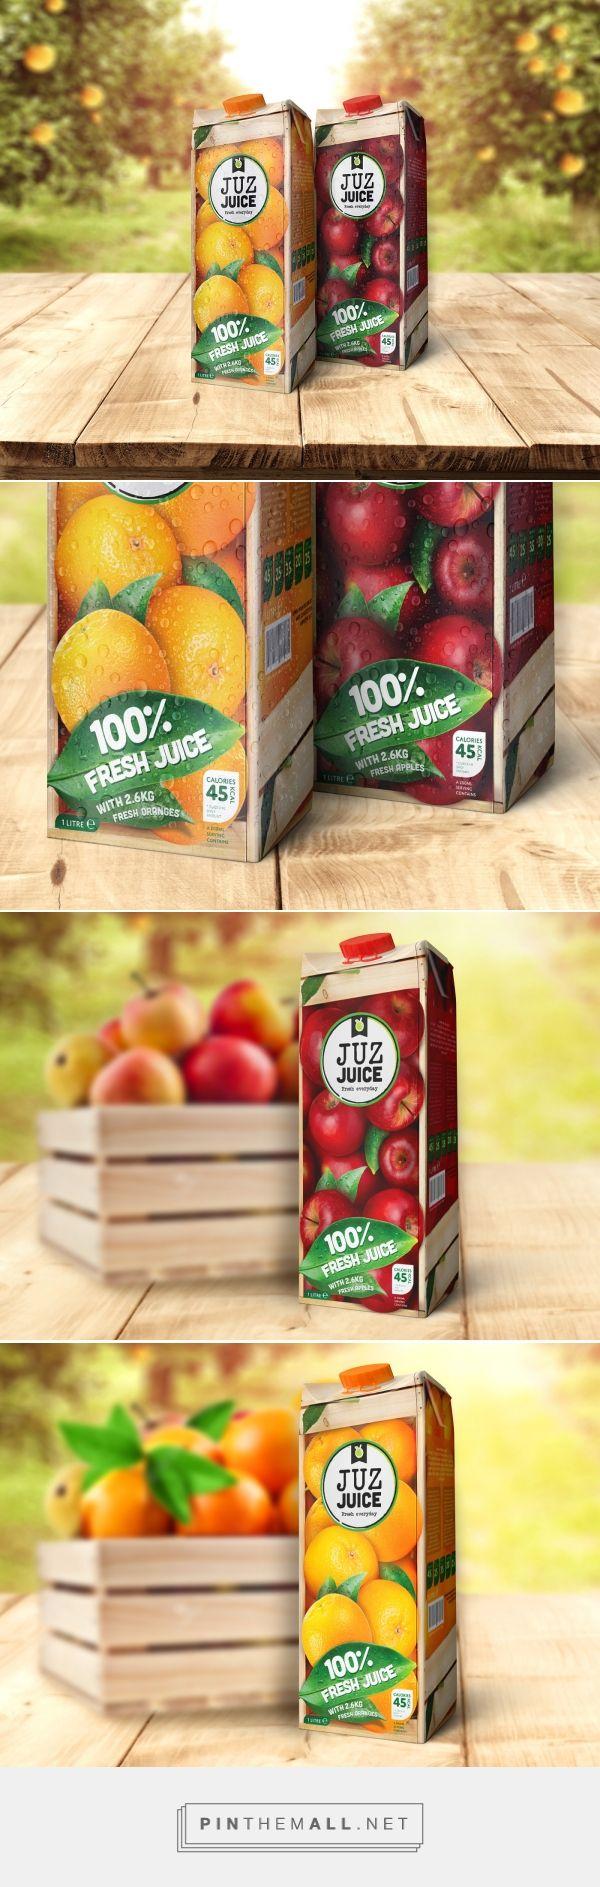 Juz Juice (Concept) - Packaging of the World - Creative Package Design Gallery - http://www.packagingoftheworld.com/2017/06/juz-juice-concept.html